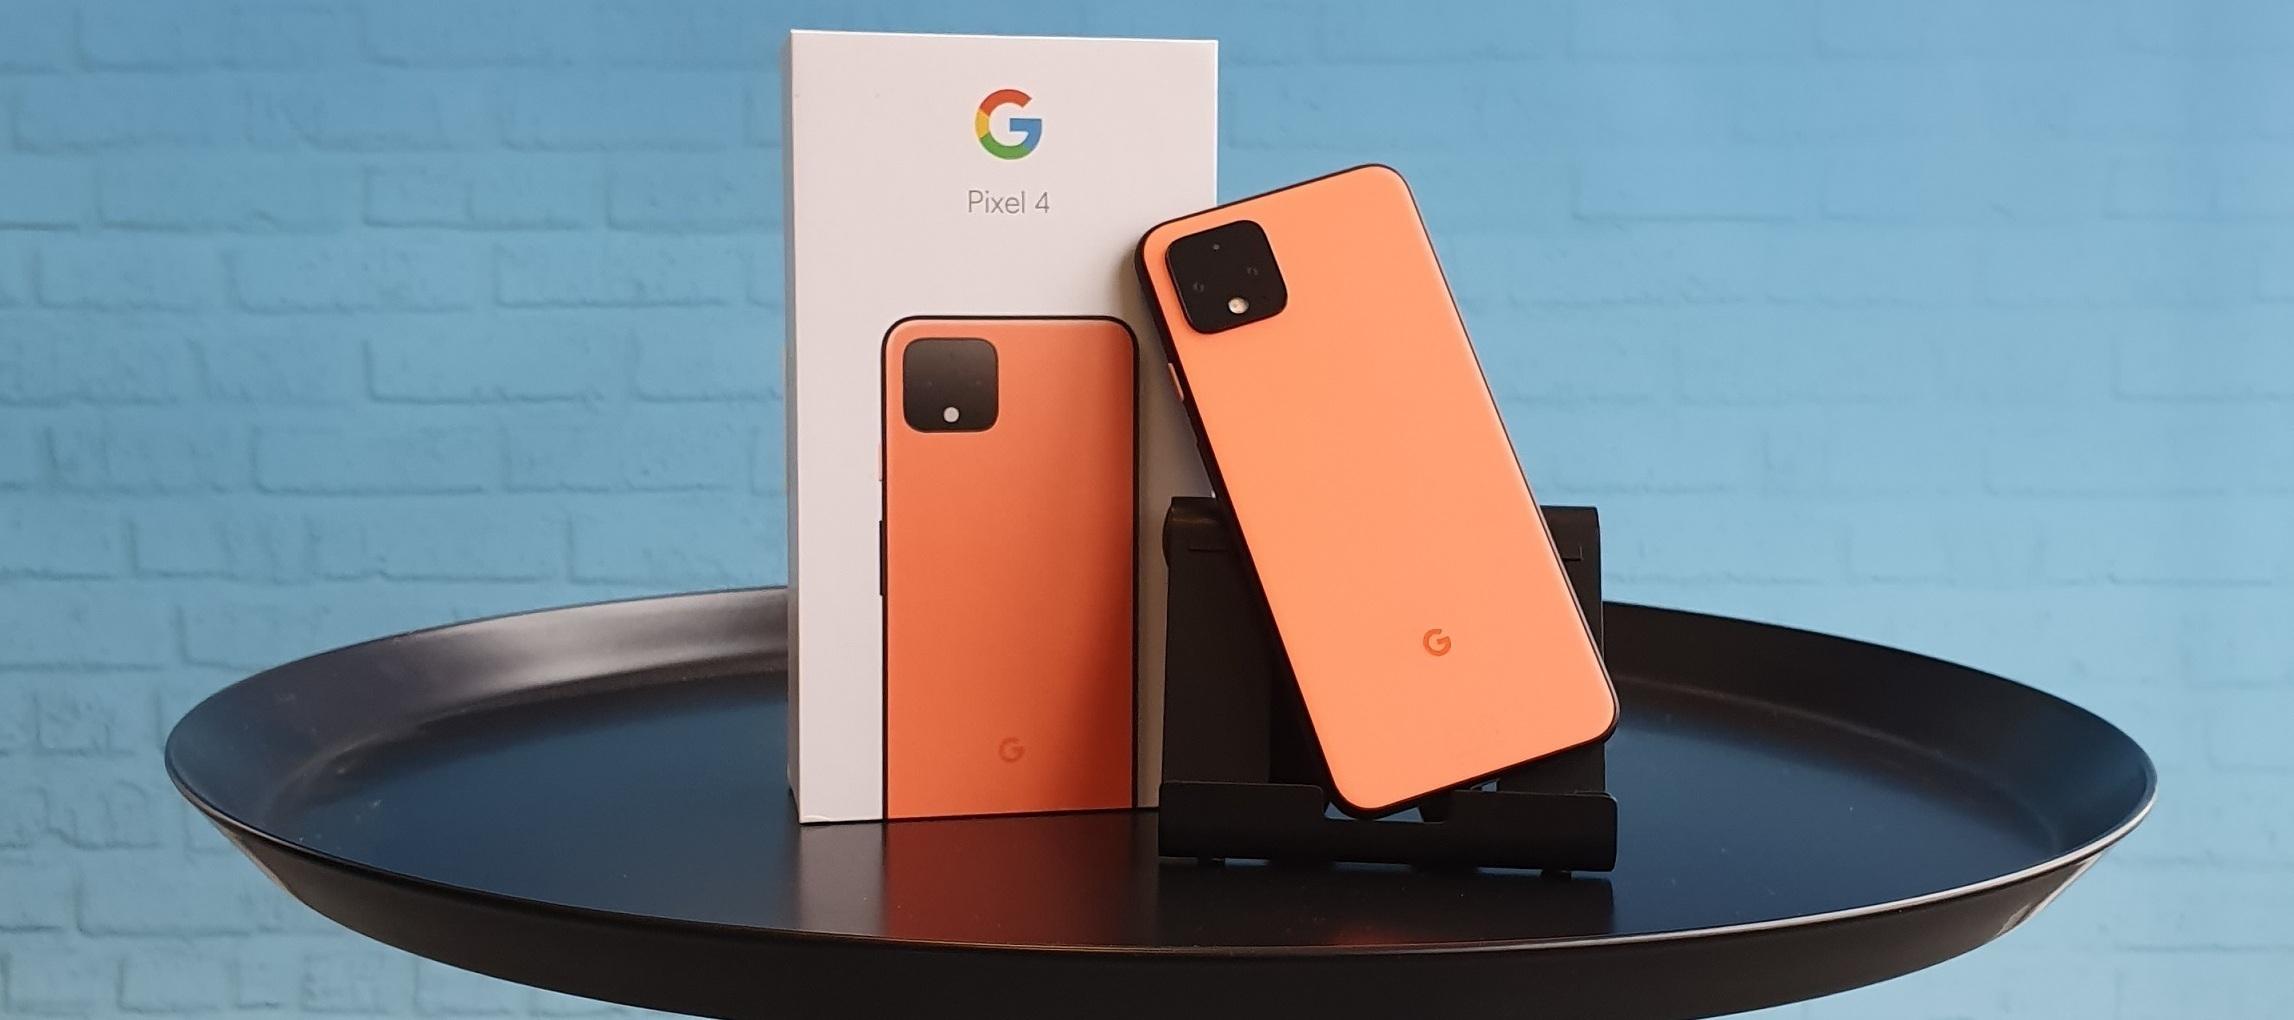 Google Pixel 4 oh, so orange  - Tester/in gesucht.